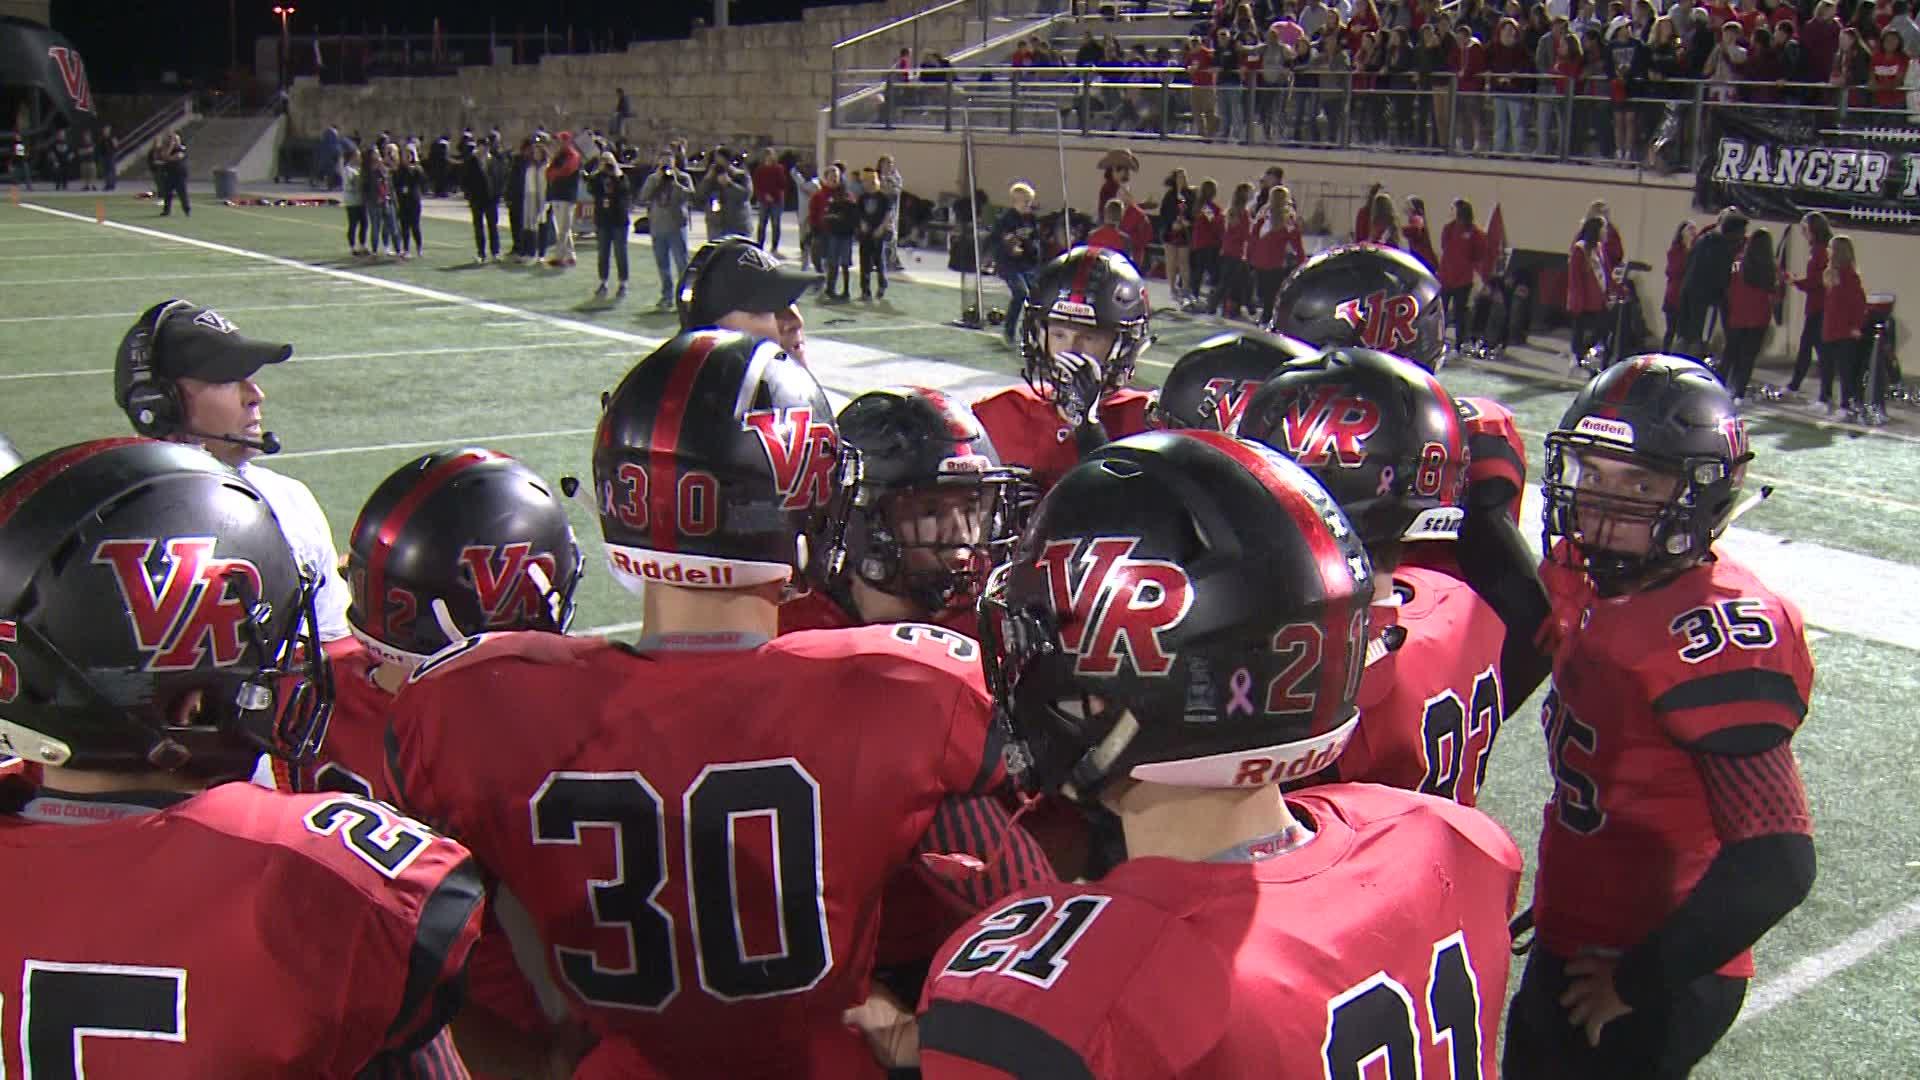 Westlake vs. Vista Ridge football (KXAN Photo)_579391